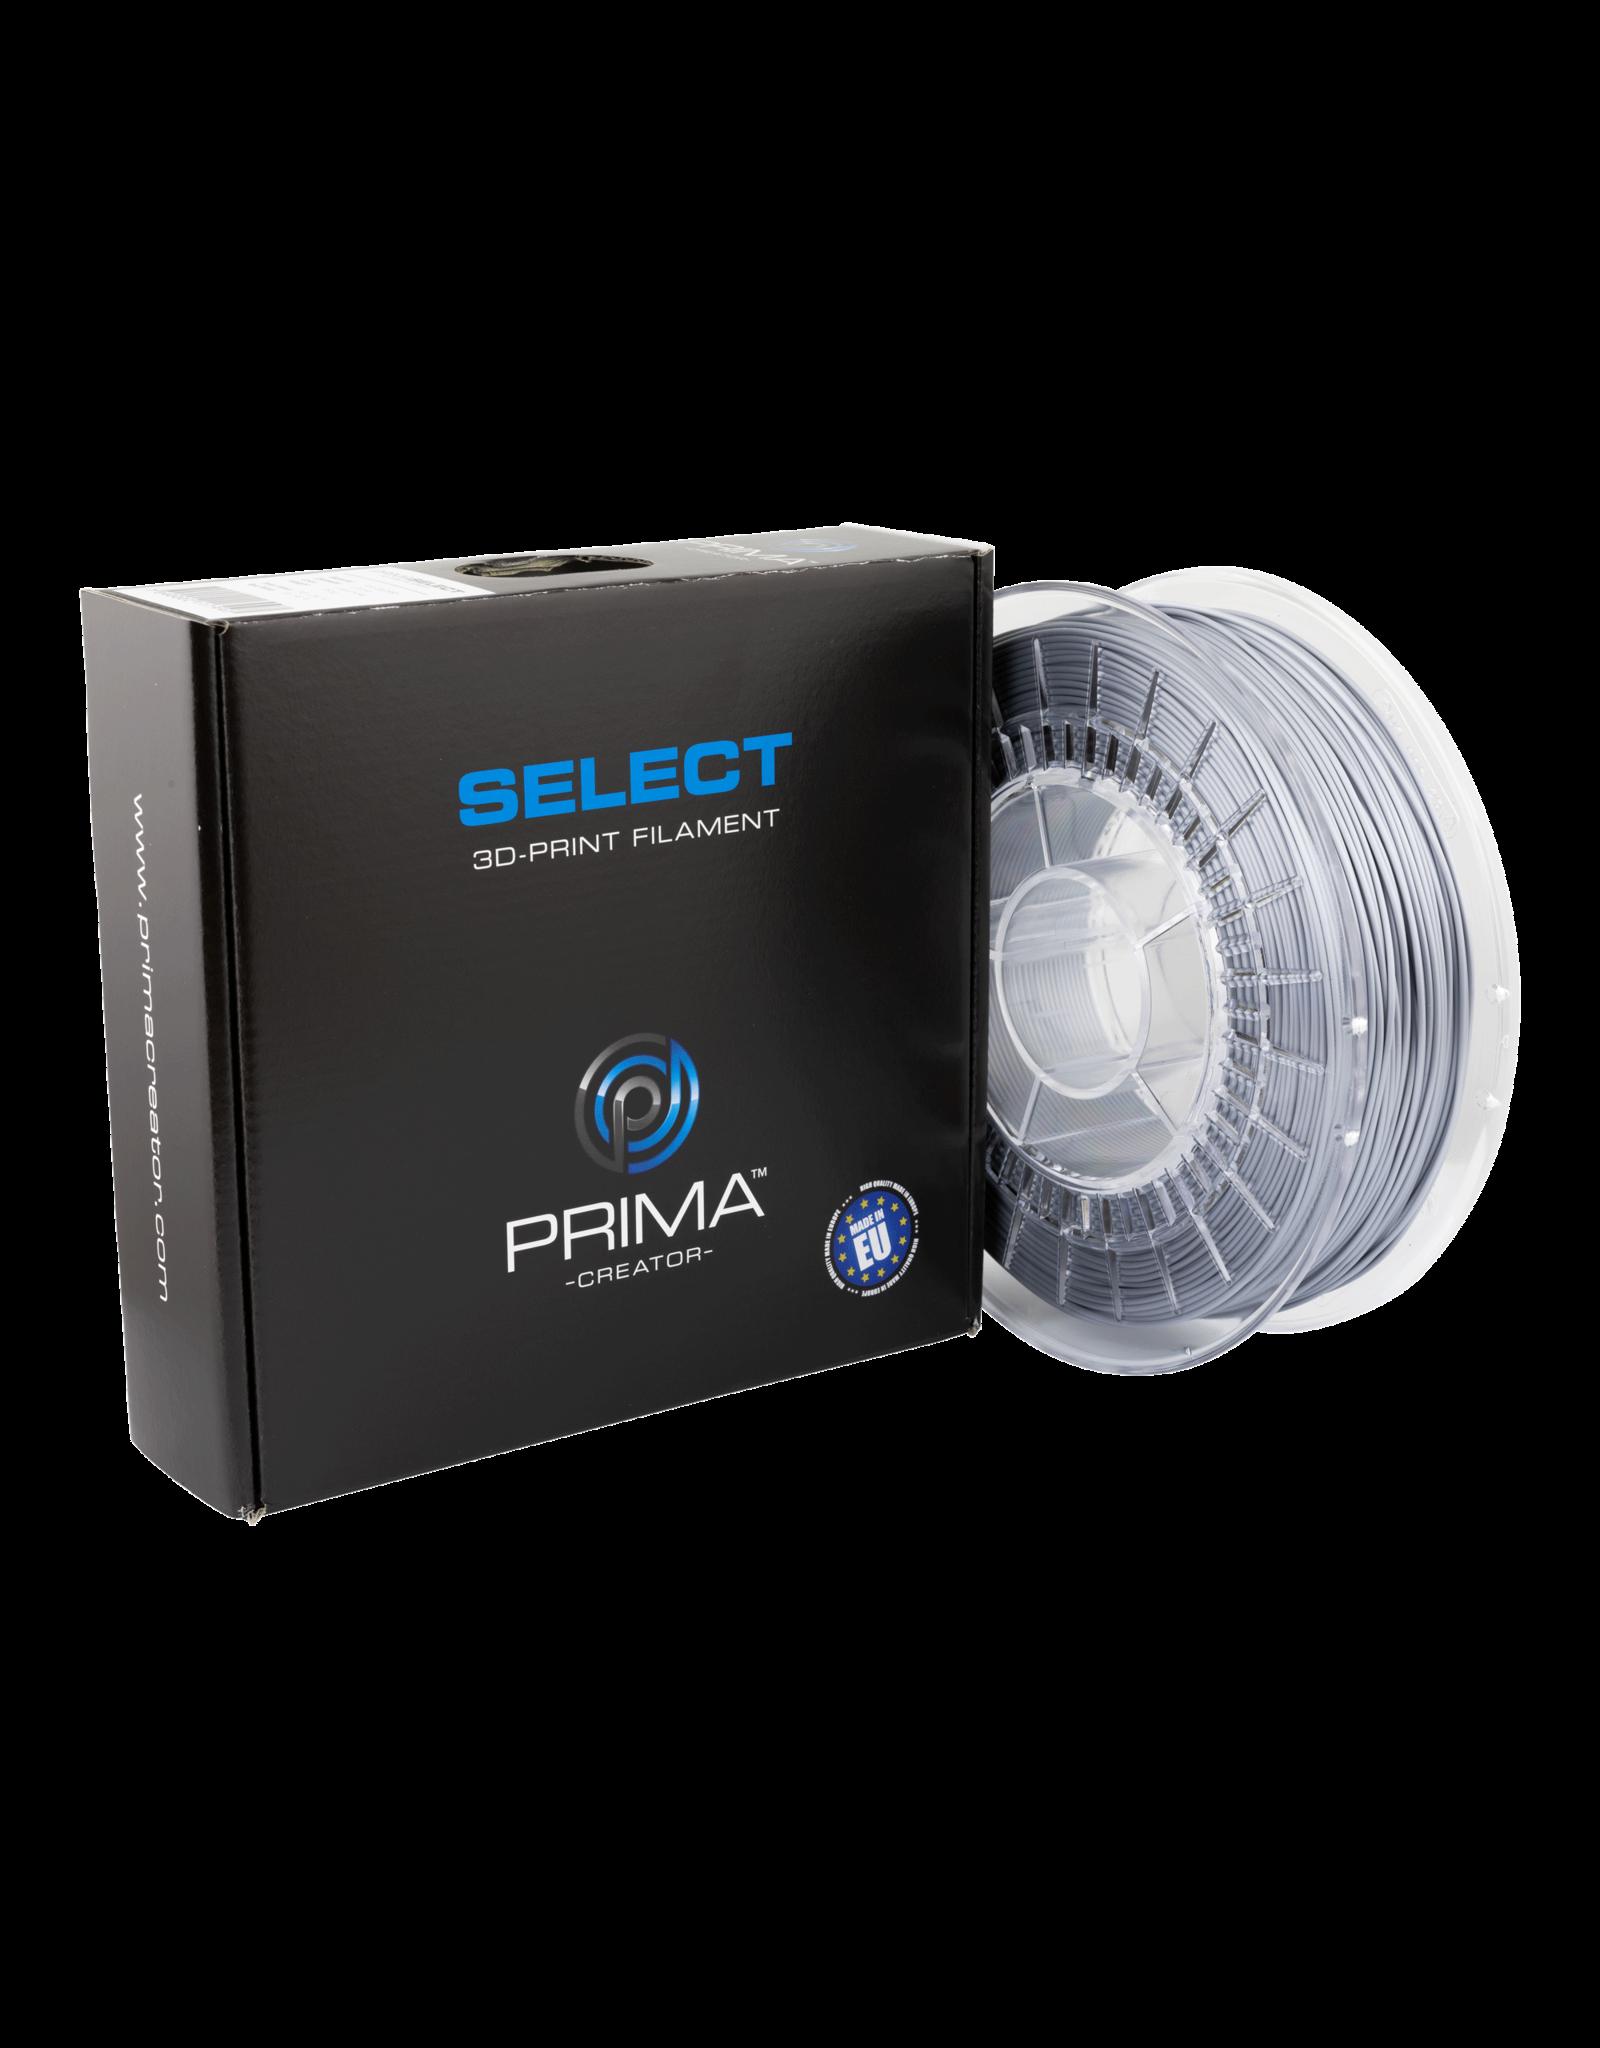 Prima PrimaSelect PLA Glossy - 1.75mm - 750 g  -  Argent liquide